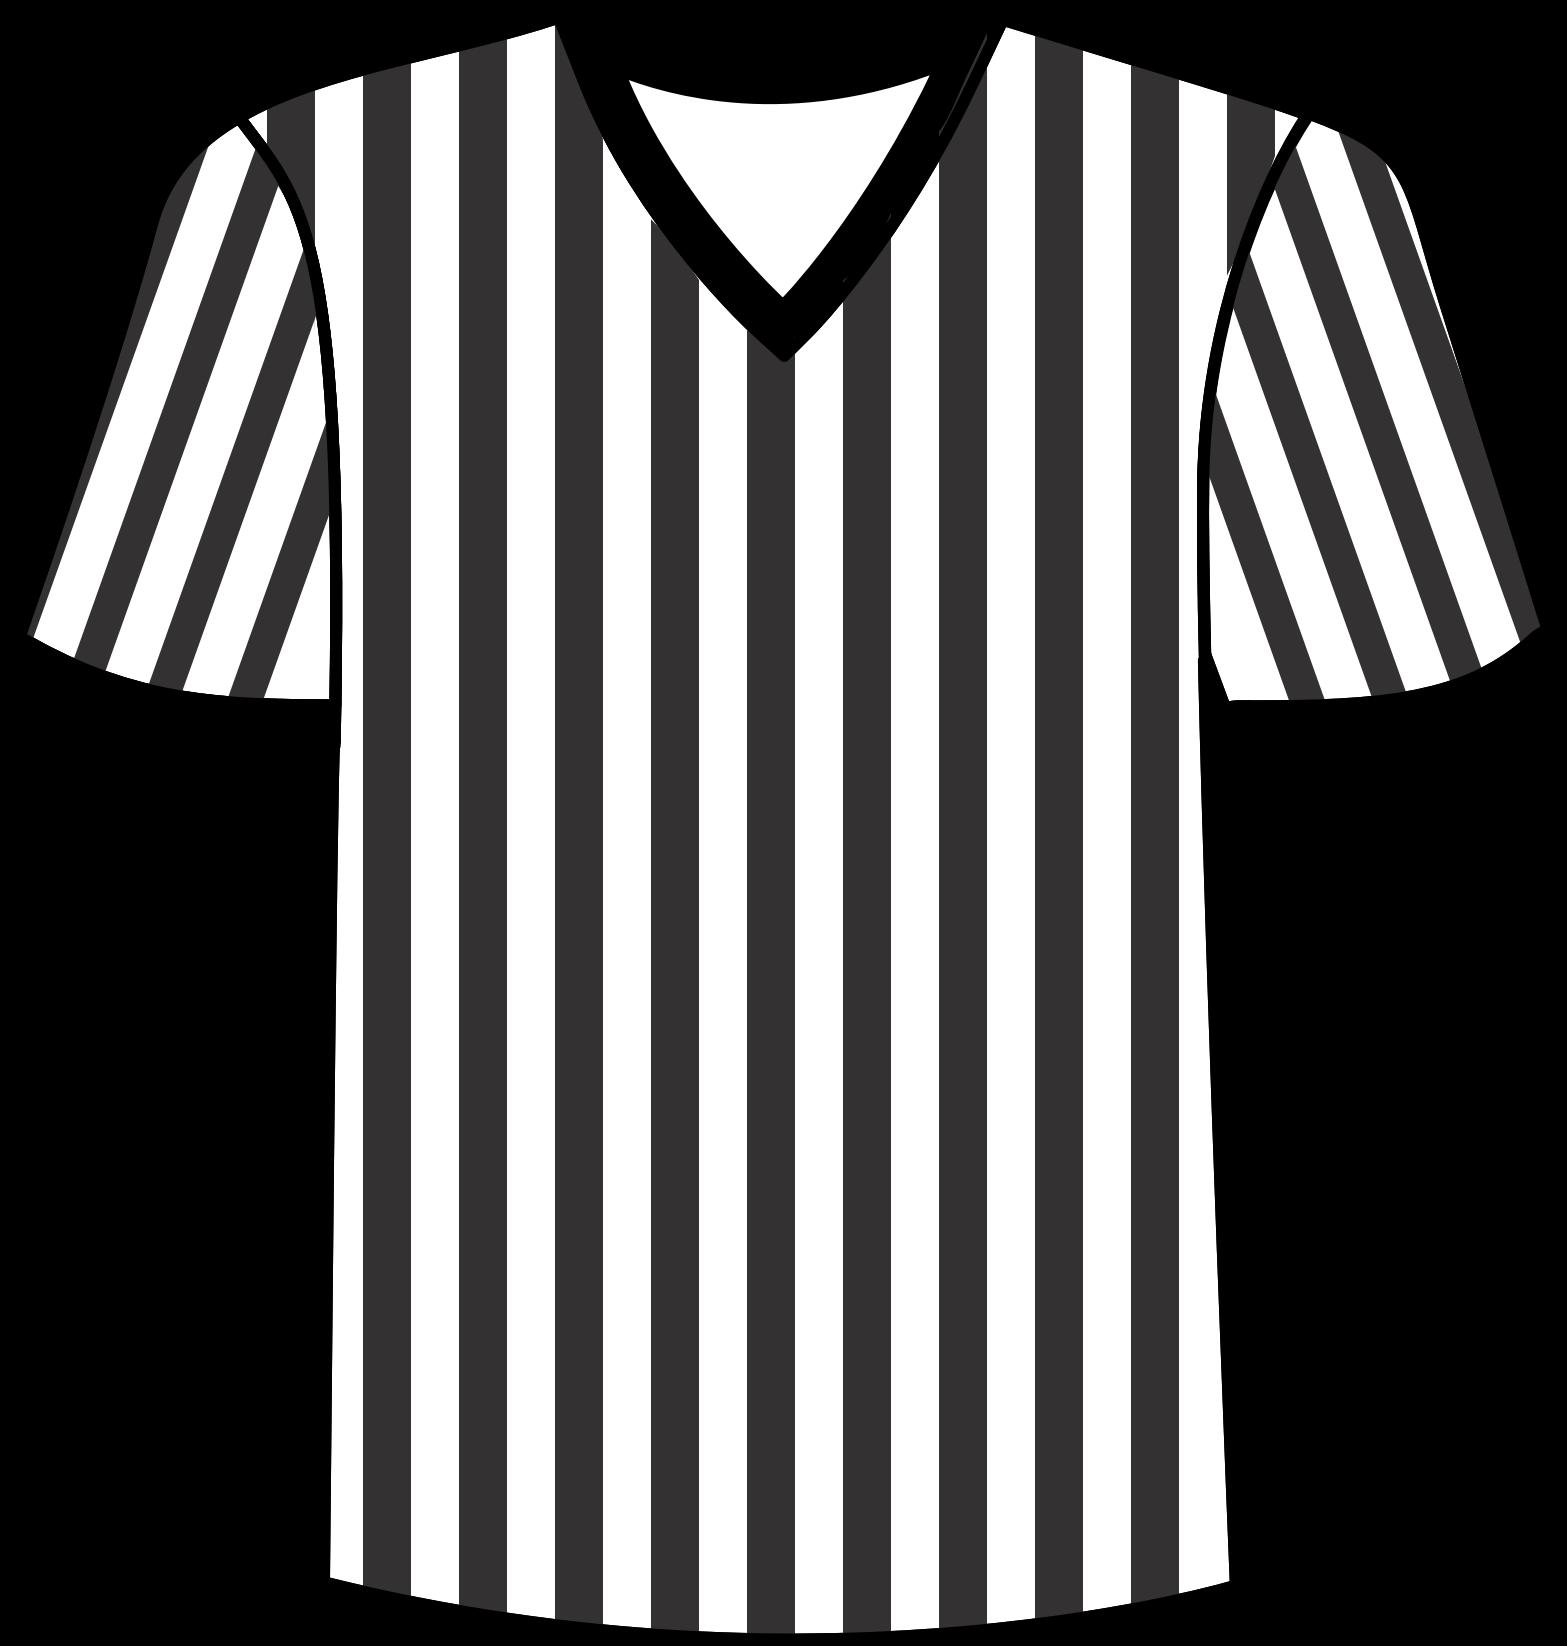 Clipart - Football Referee Shirt